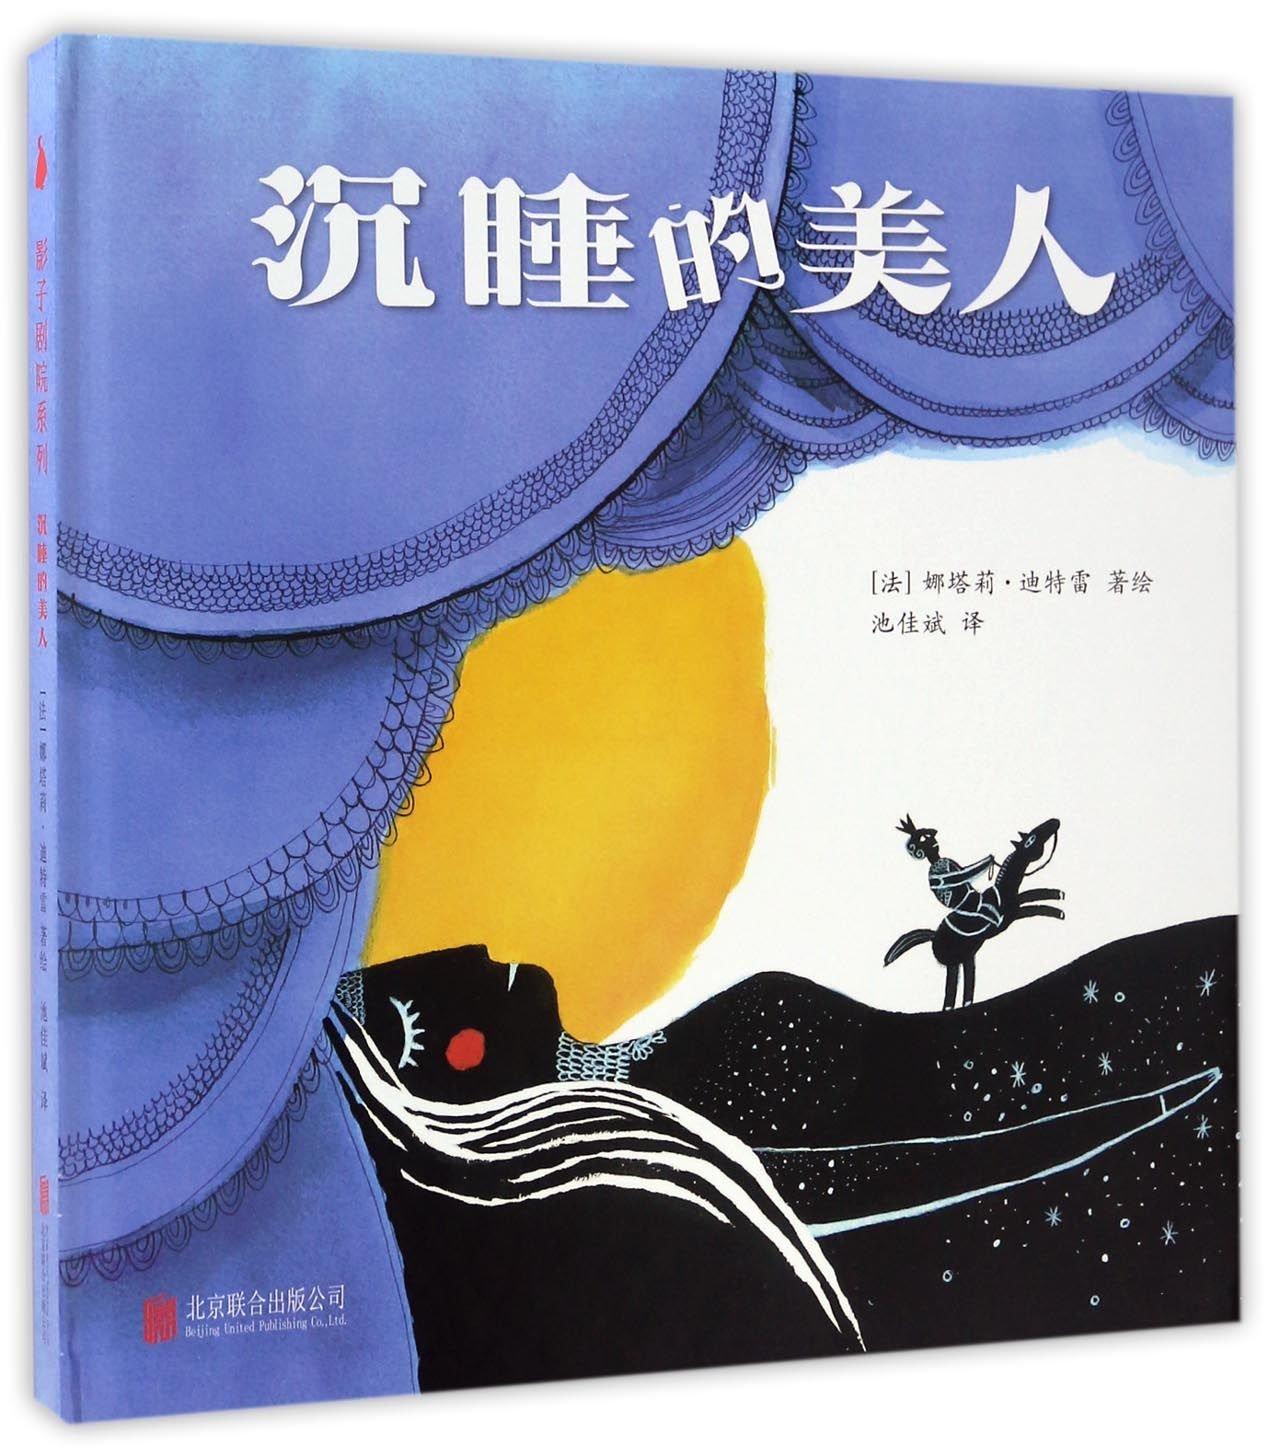 Sleeping Beauty (Chinese Edition) ebook